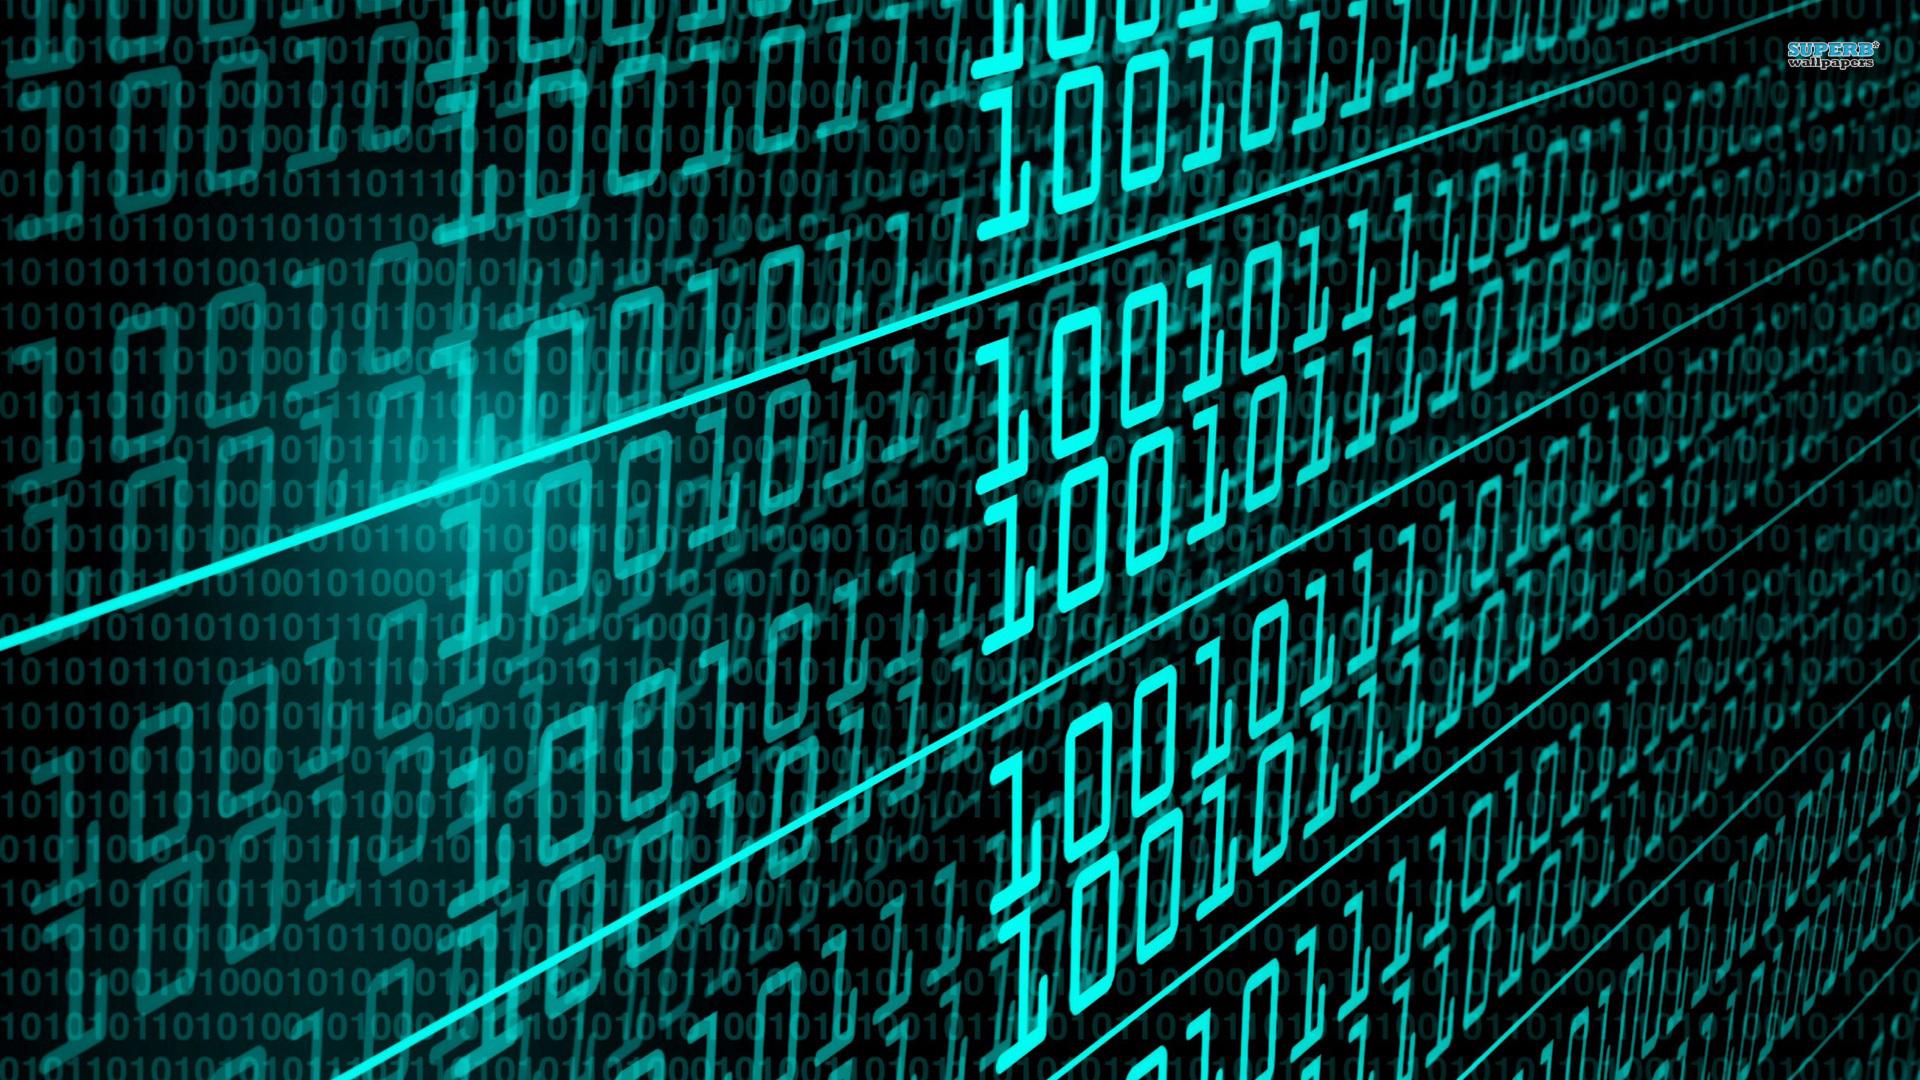 Binery code computer wallpapers desktop backgrounds - Binary background gif ...